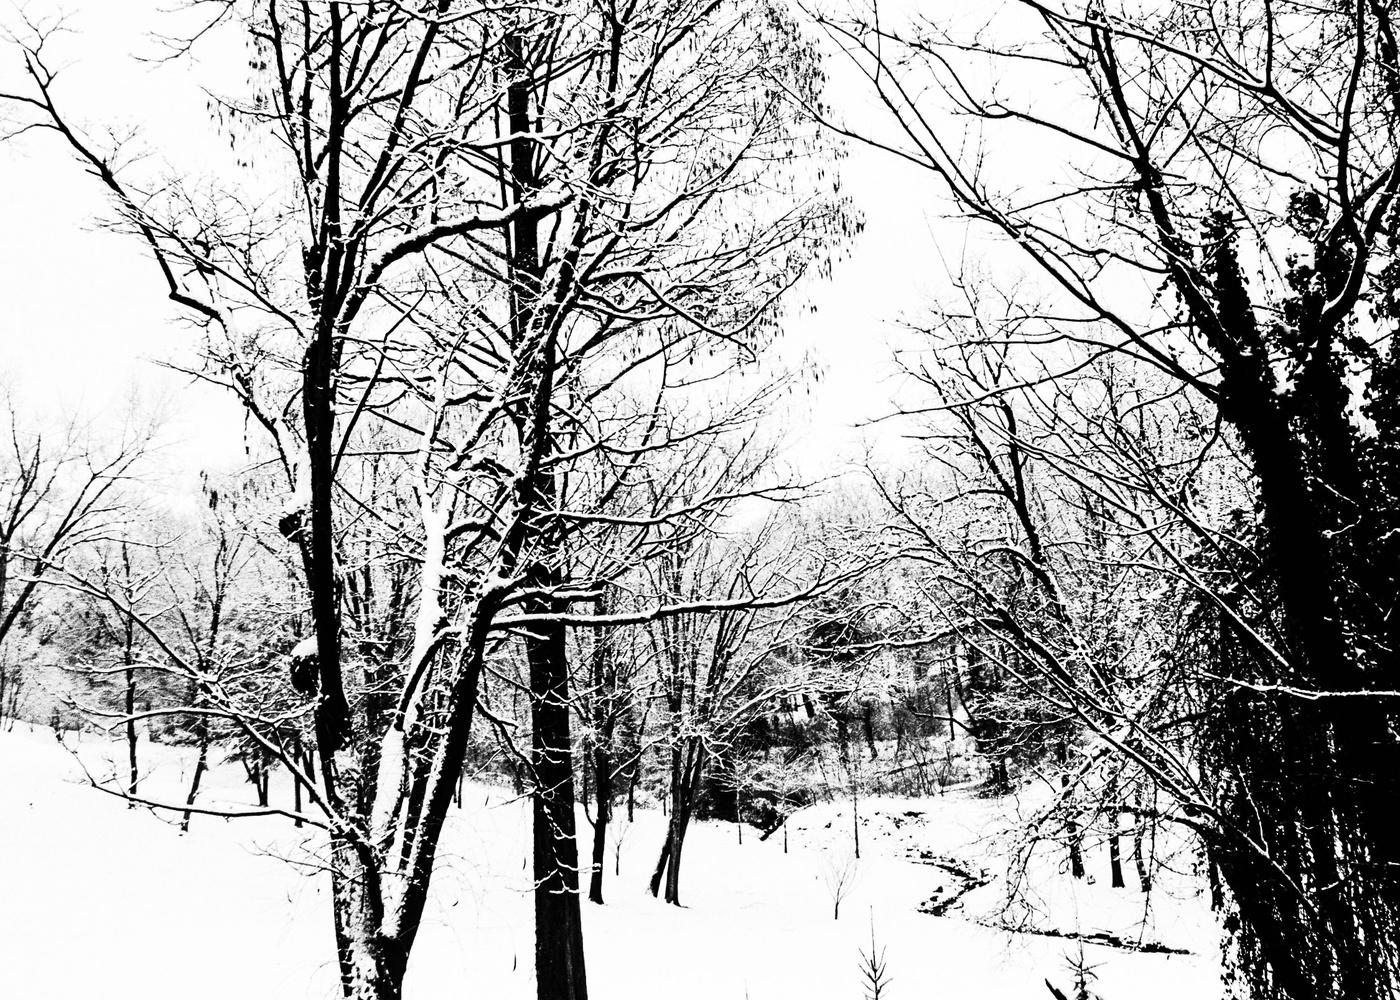 Snowy Day #2 by David Senoff